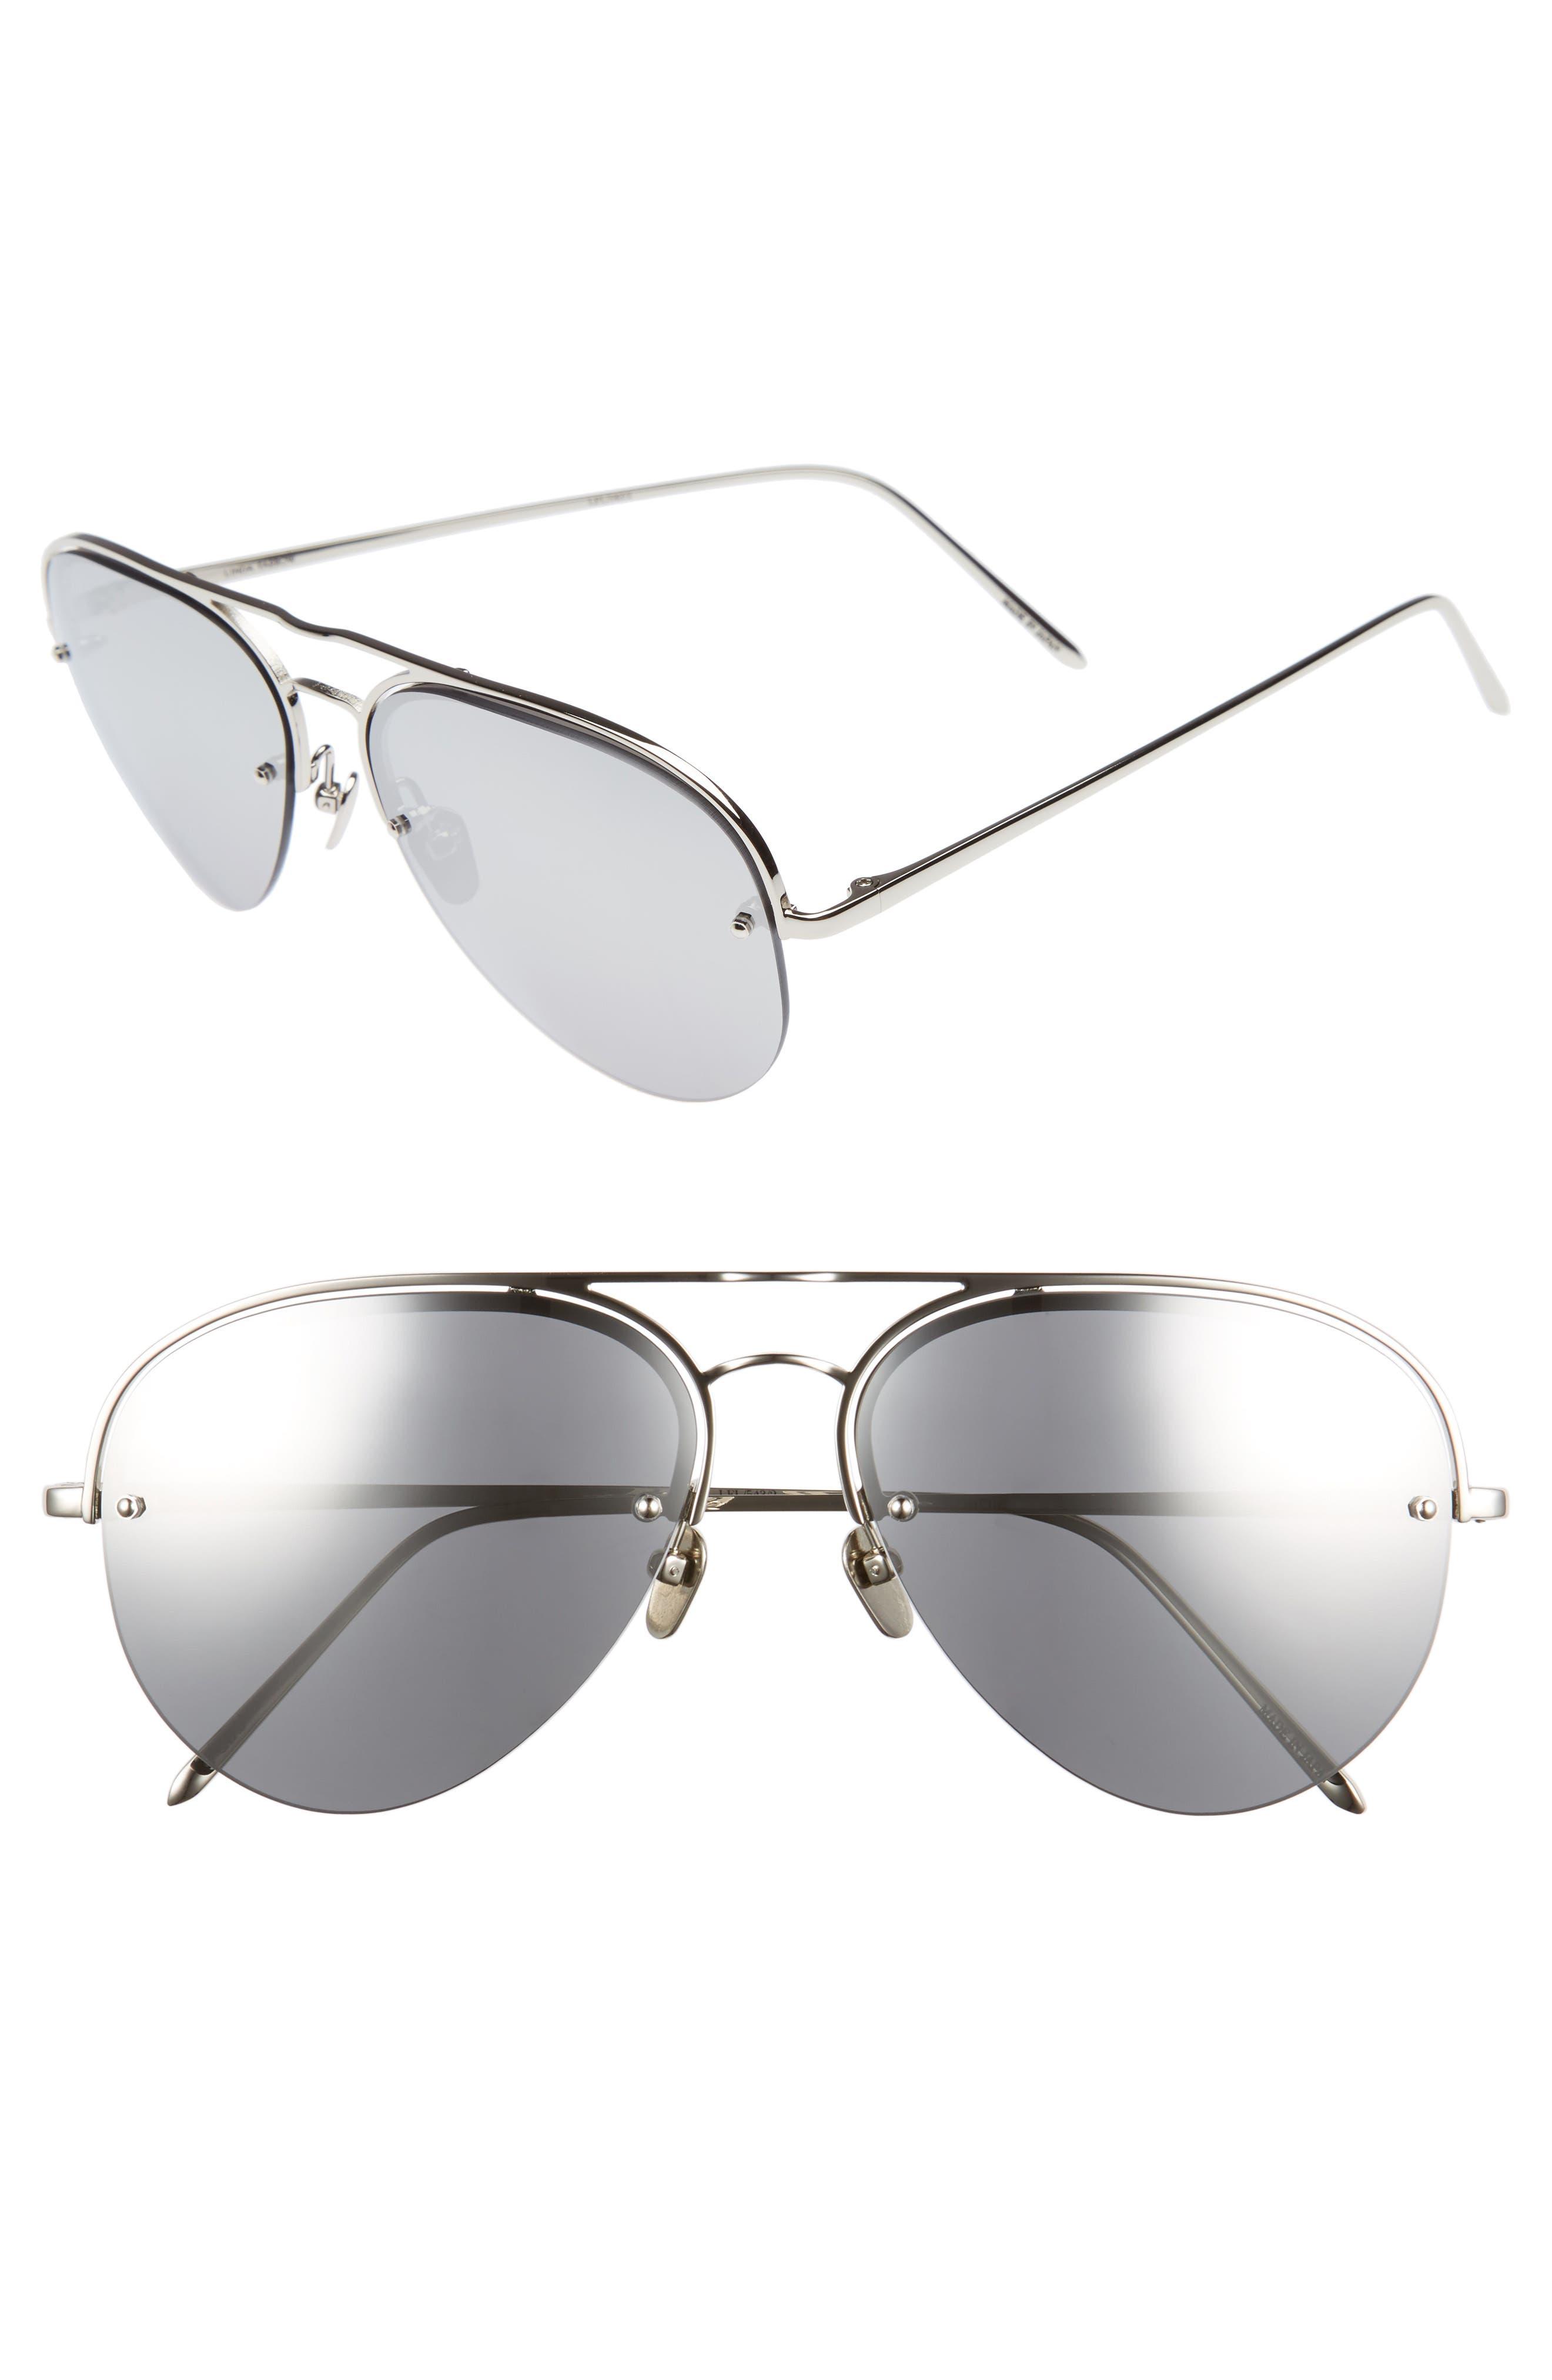 60mm Mirrored 18 Karat Gold Aviator Sunglasses,                         Main,                         color, 710